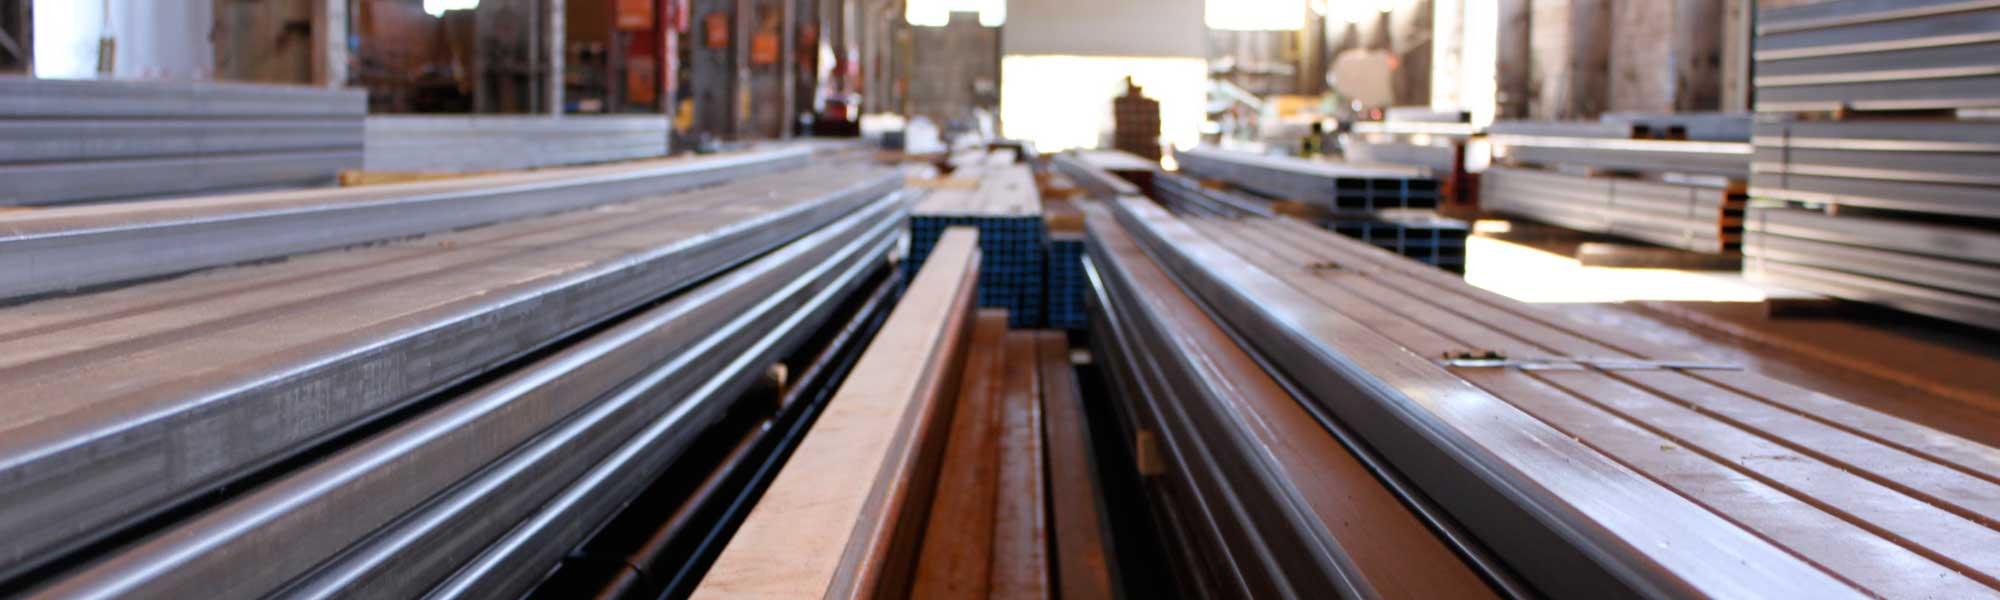 steel tubes in a metal warehouse